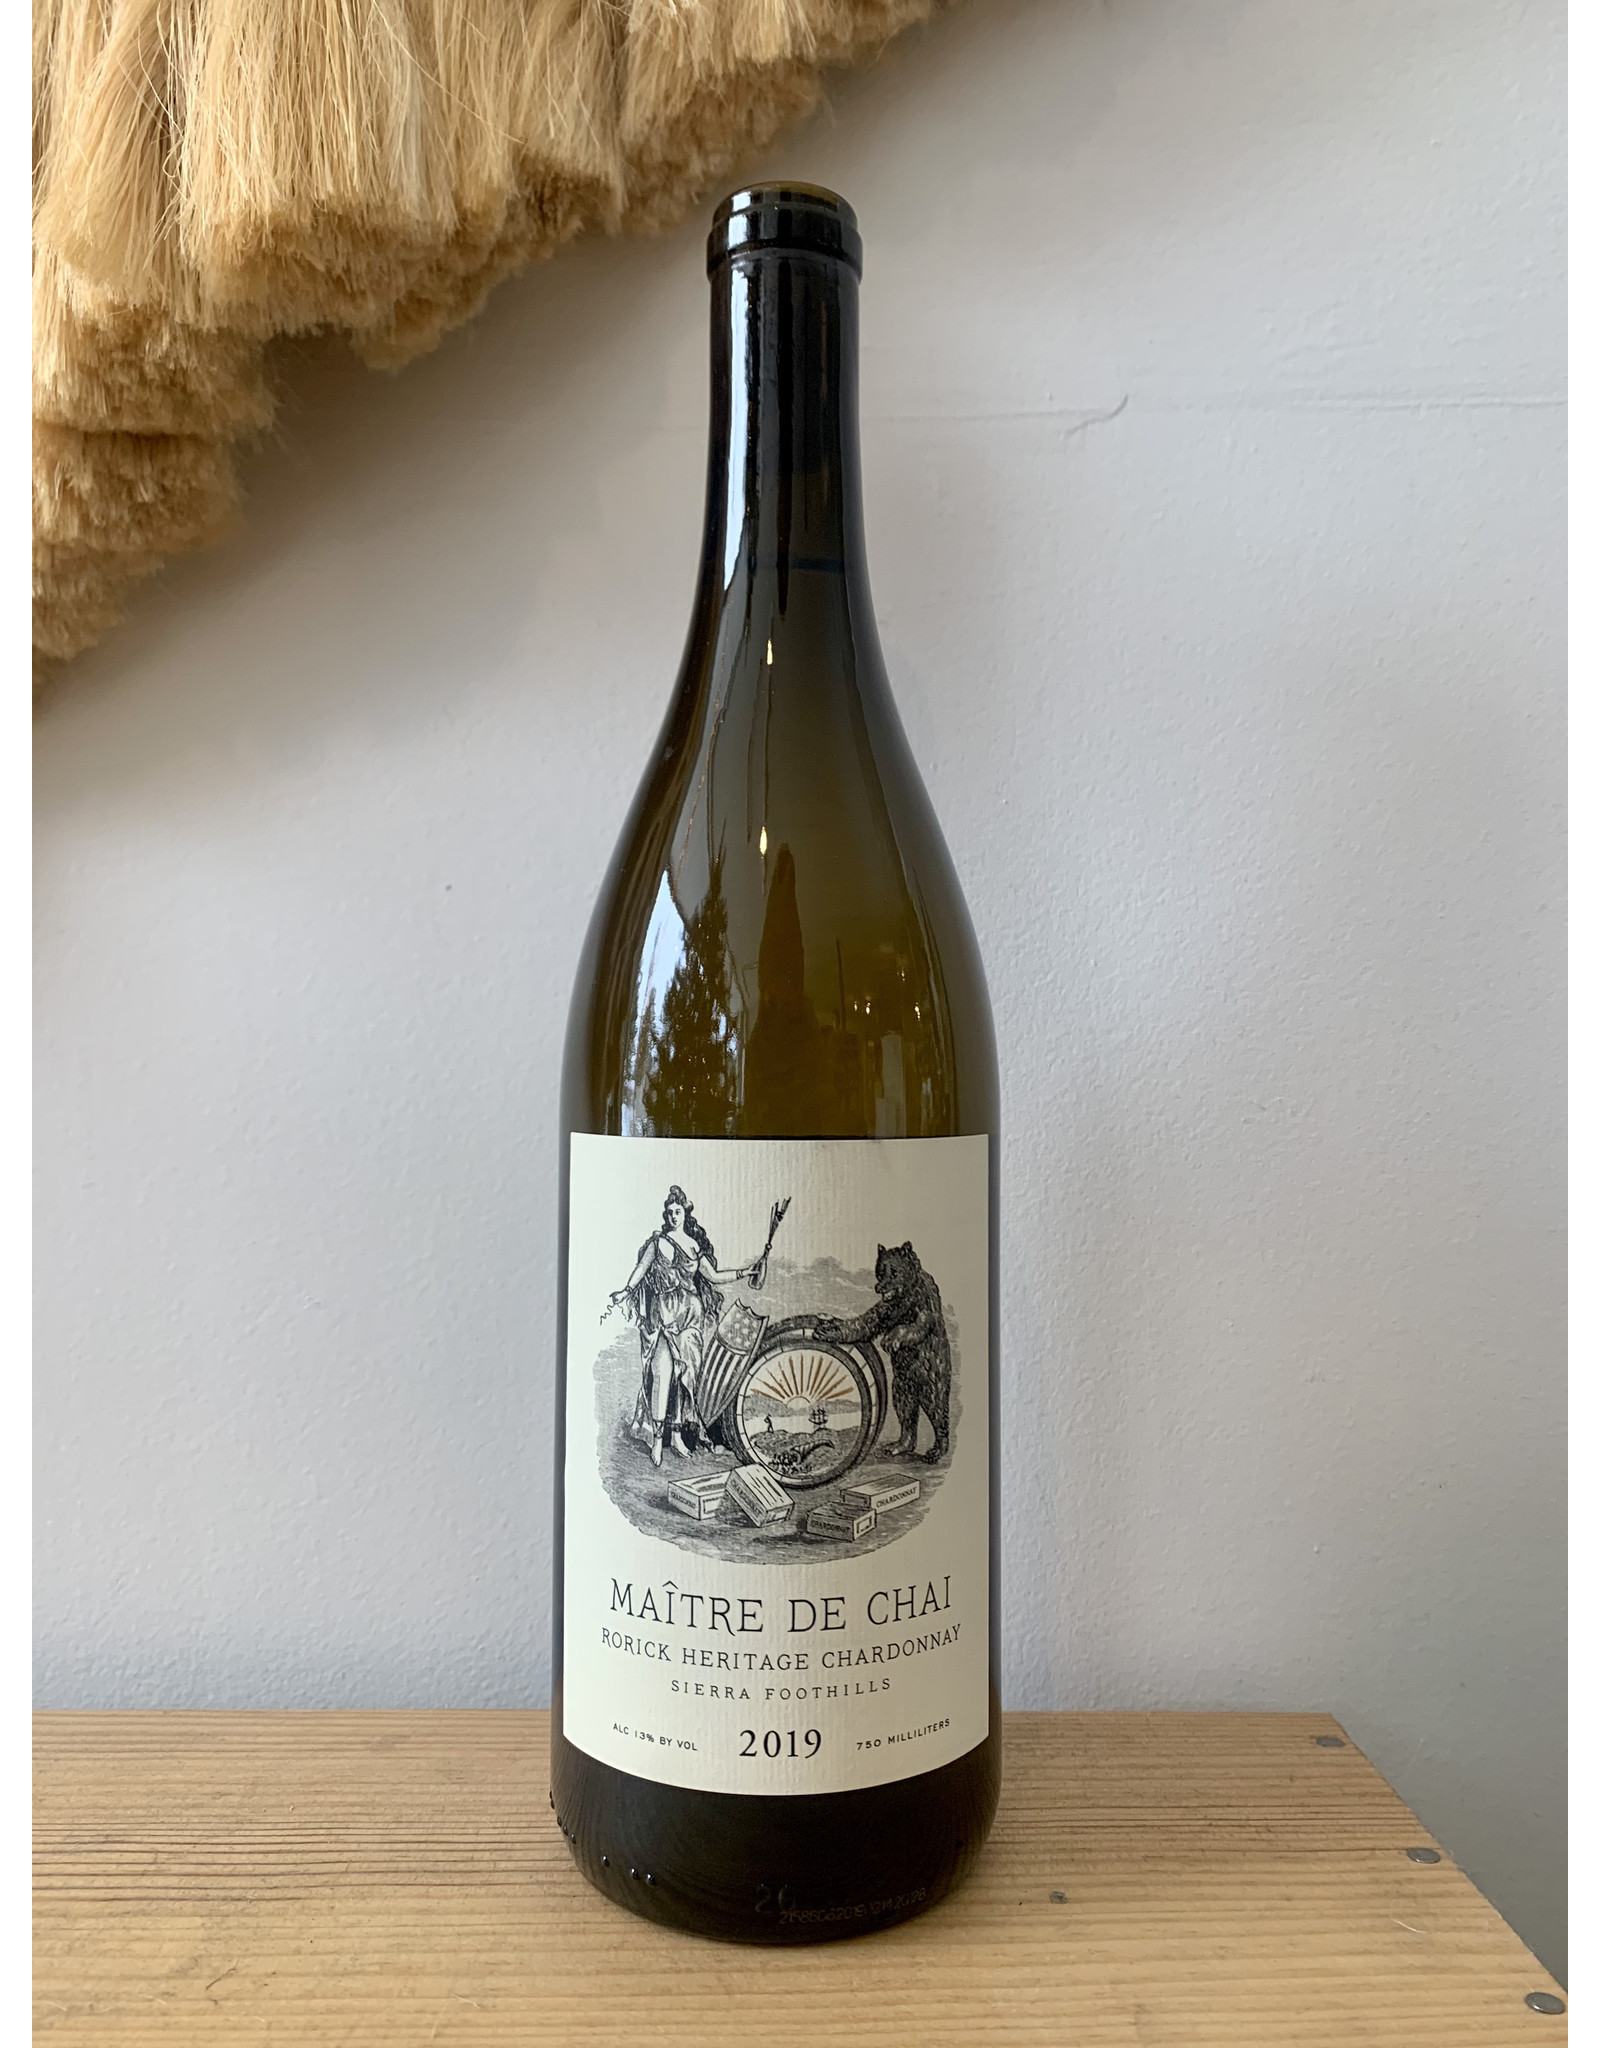 Maître de Chai Rorick Heritage Chardonnay Sierra Foothills 2019